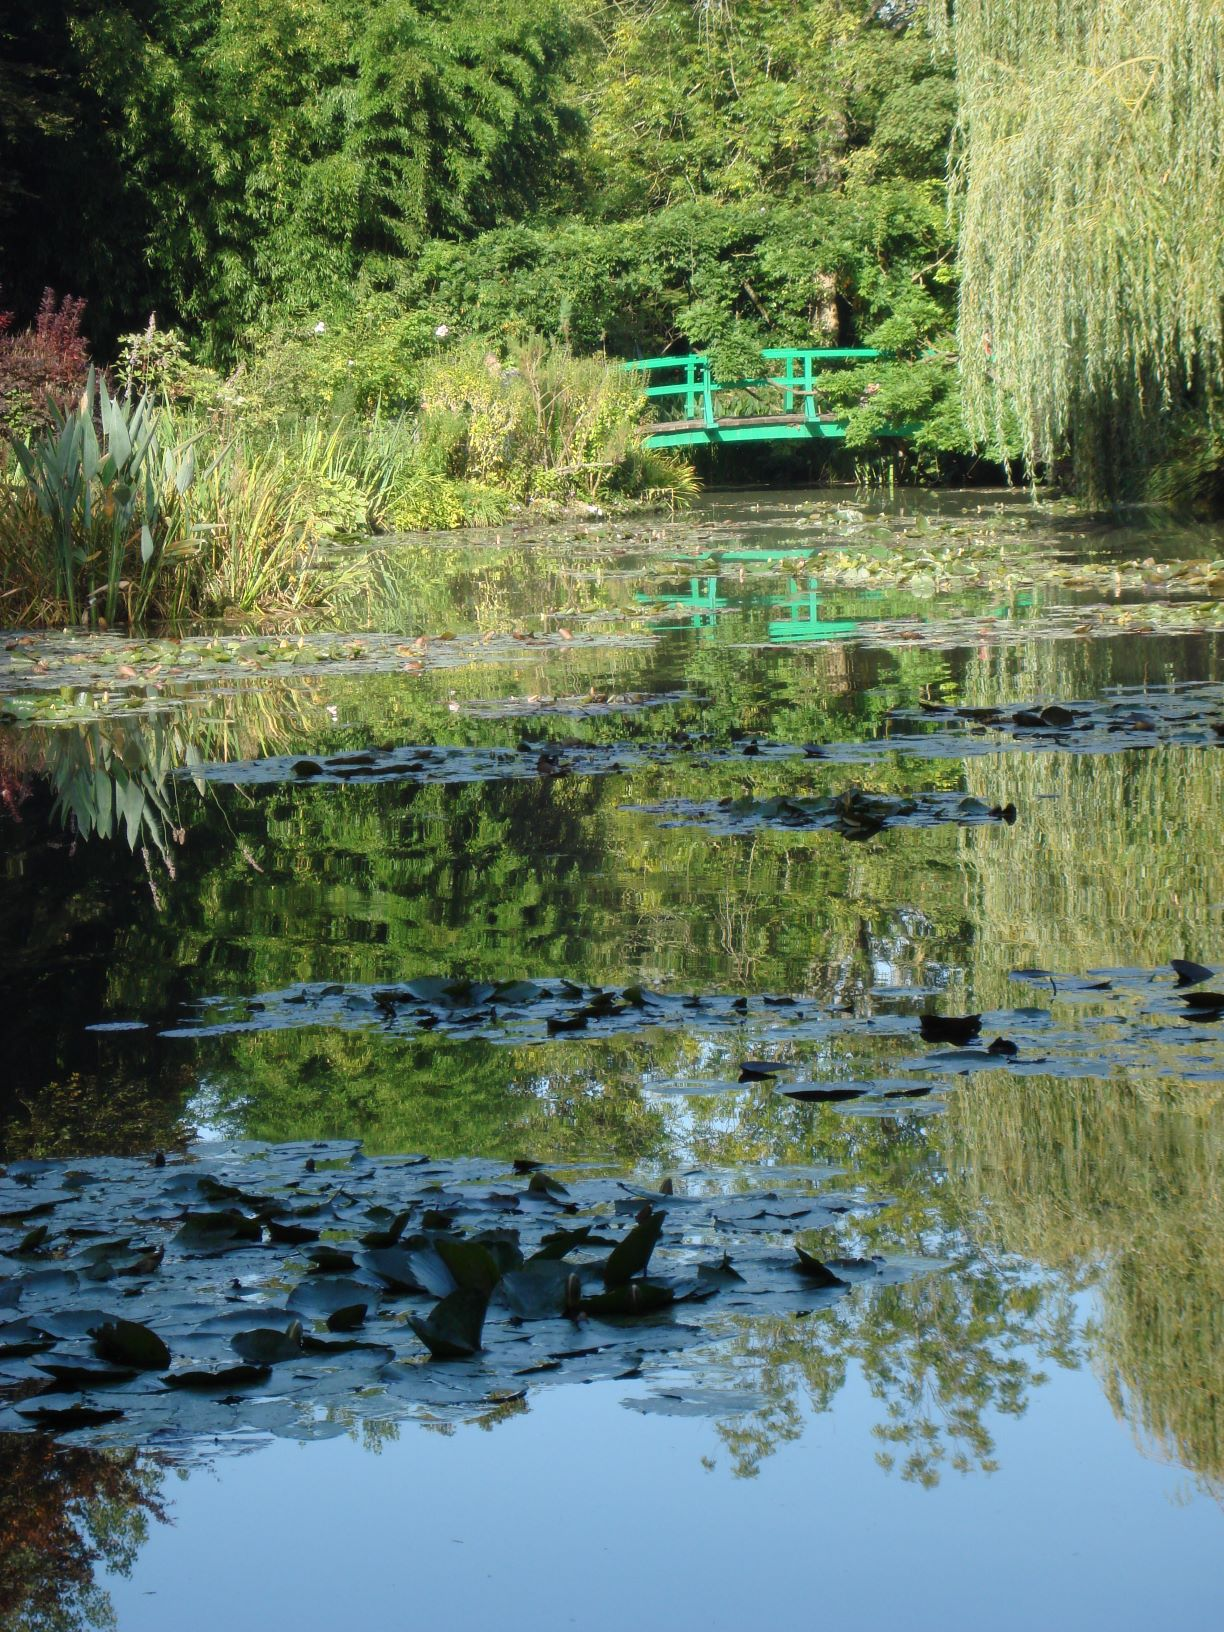 Monet's BridgeResizedForWebsite